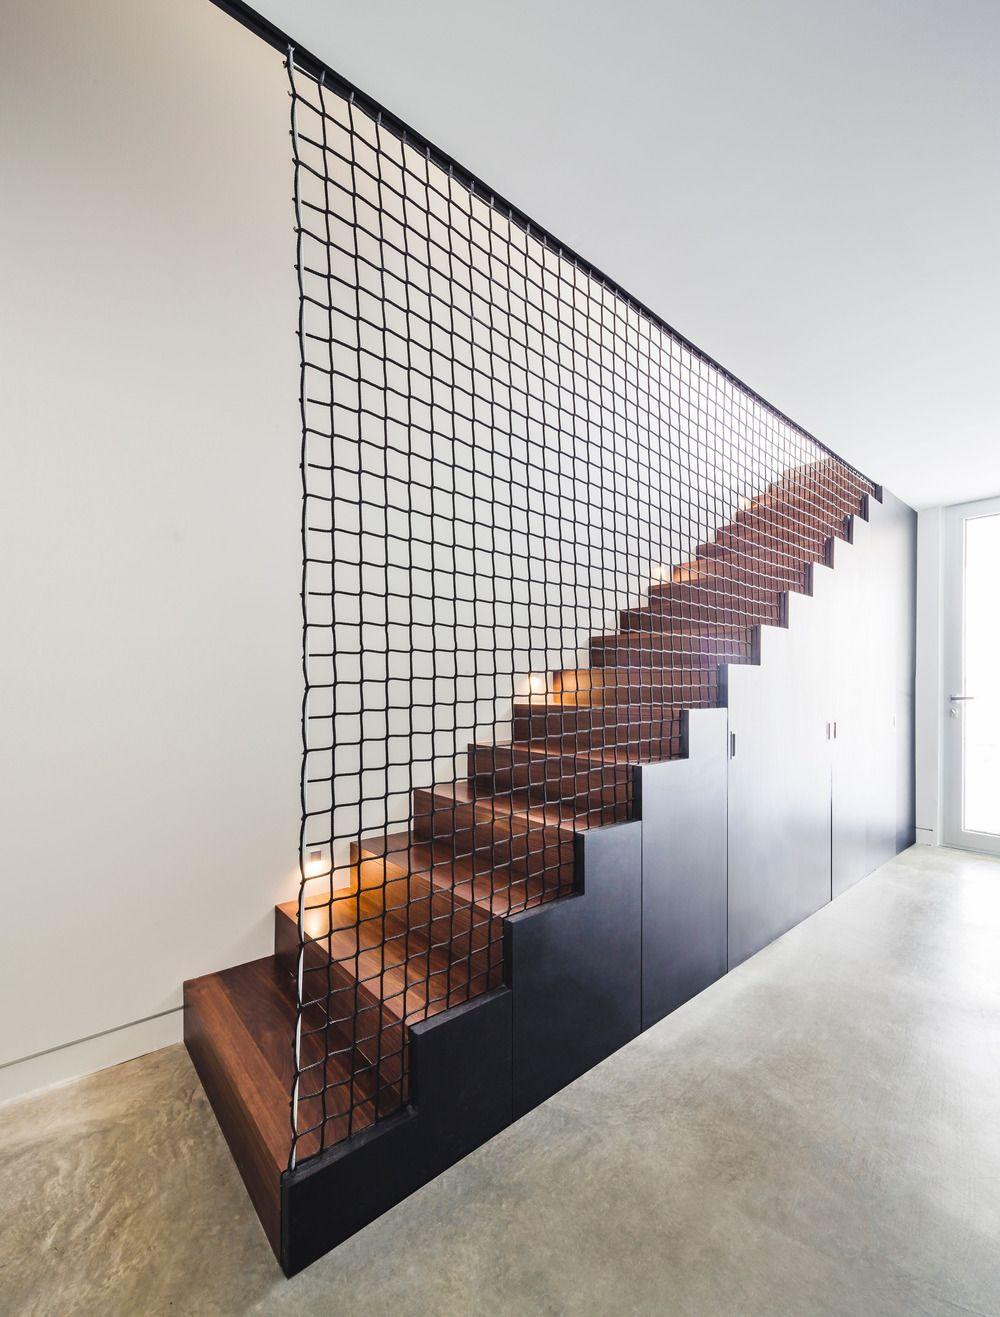 MU Architecture: The Nook